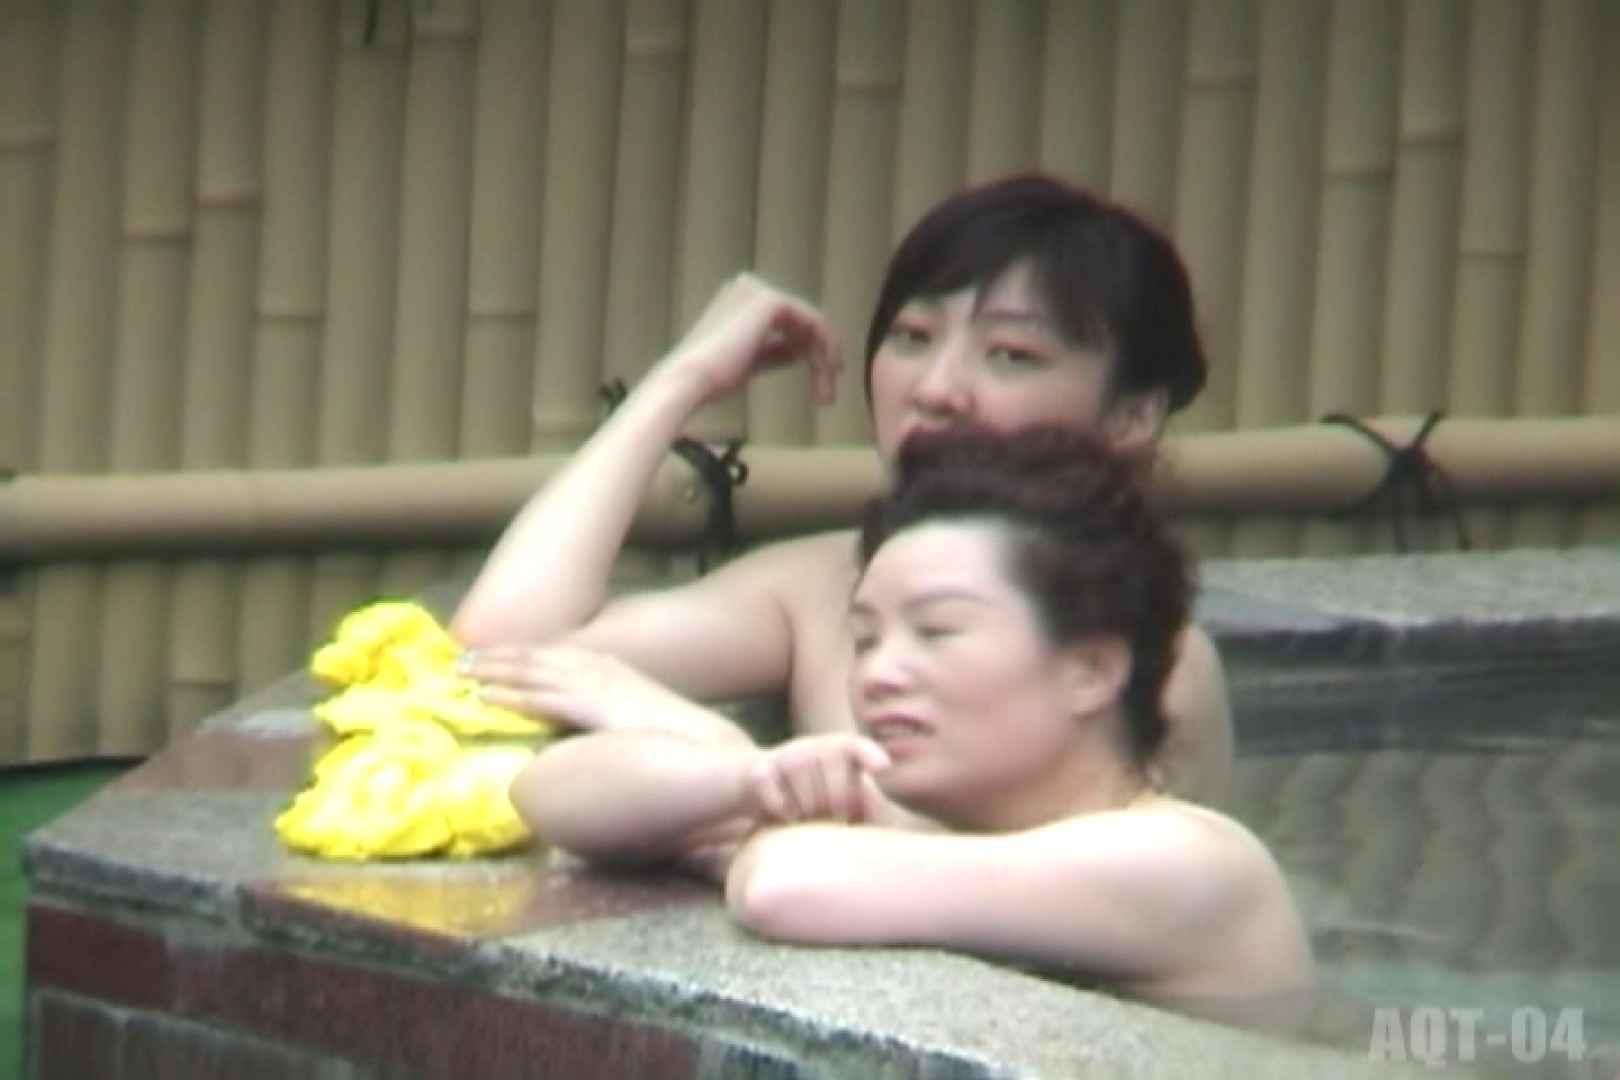 Aquaな露天風呂Vol.743 盗撮映像  75Pix 37